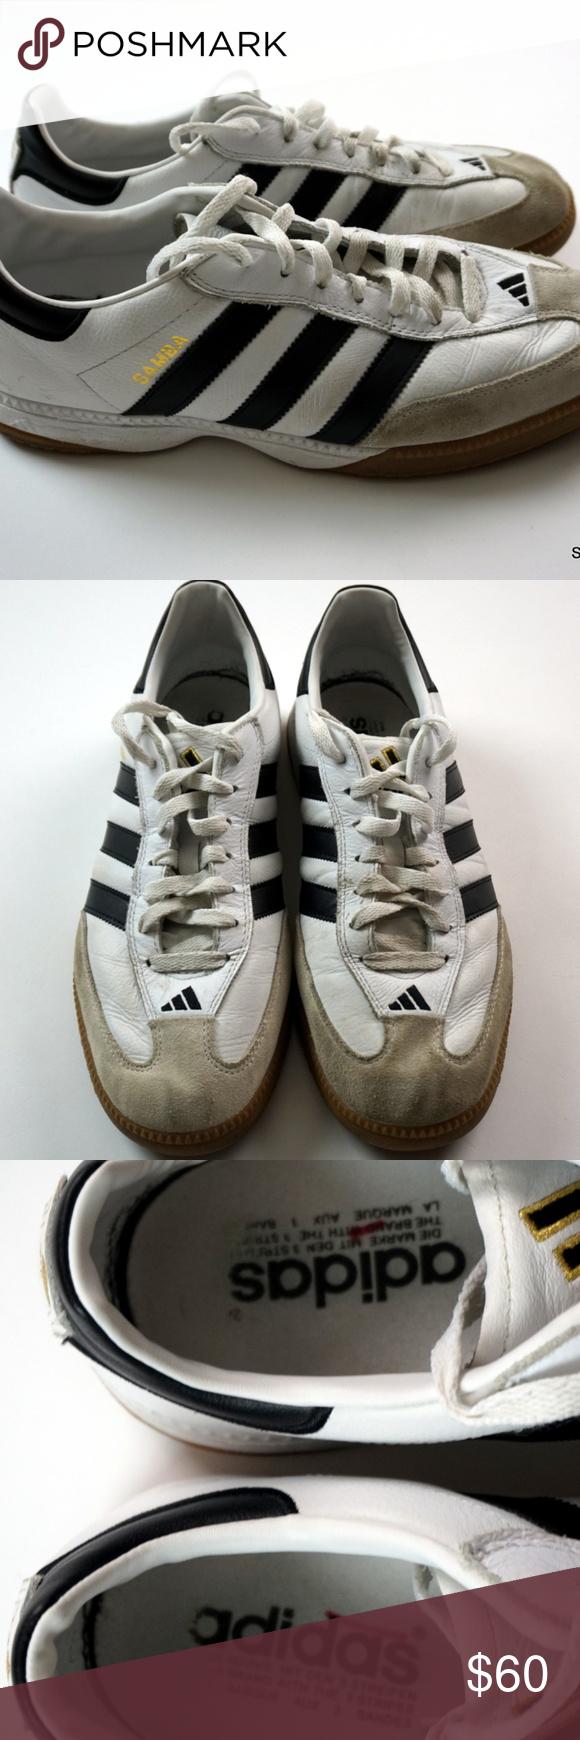 Adidas Samba Millennium Shoes White